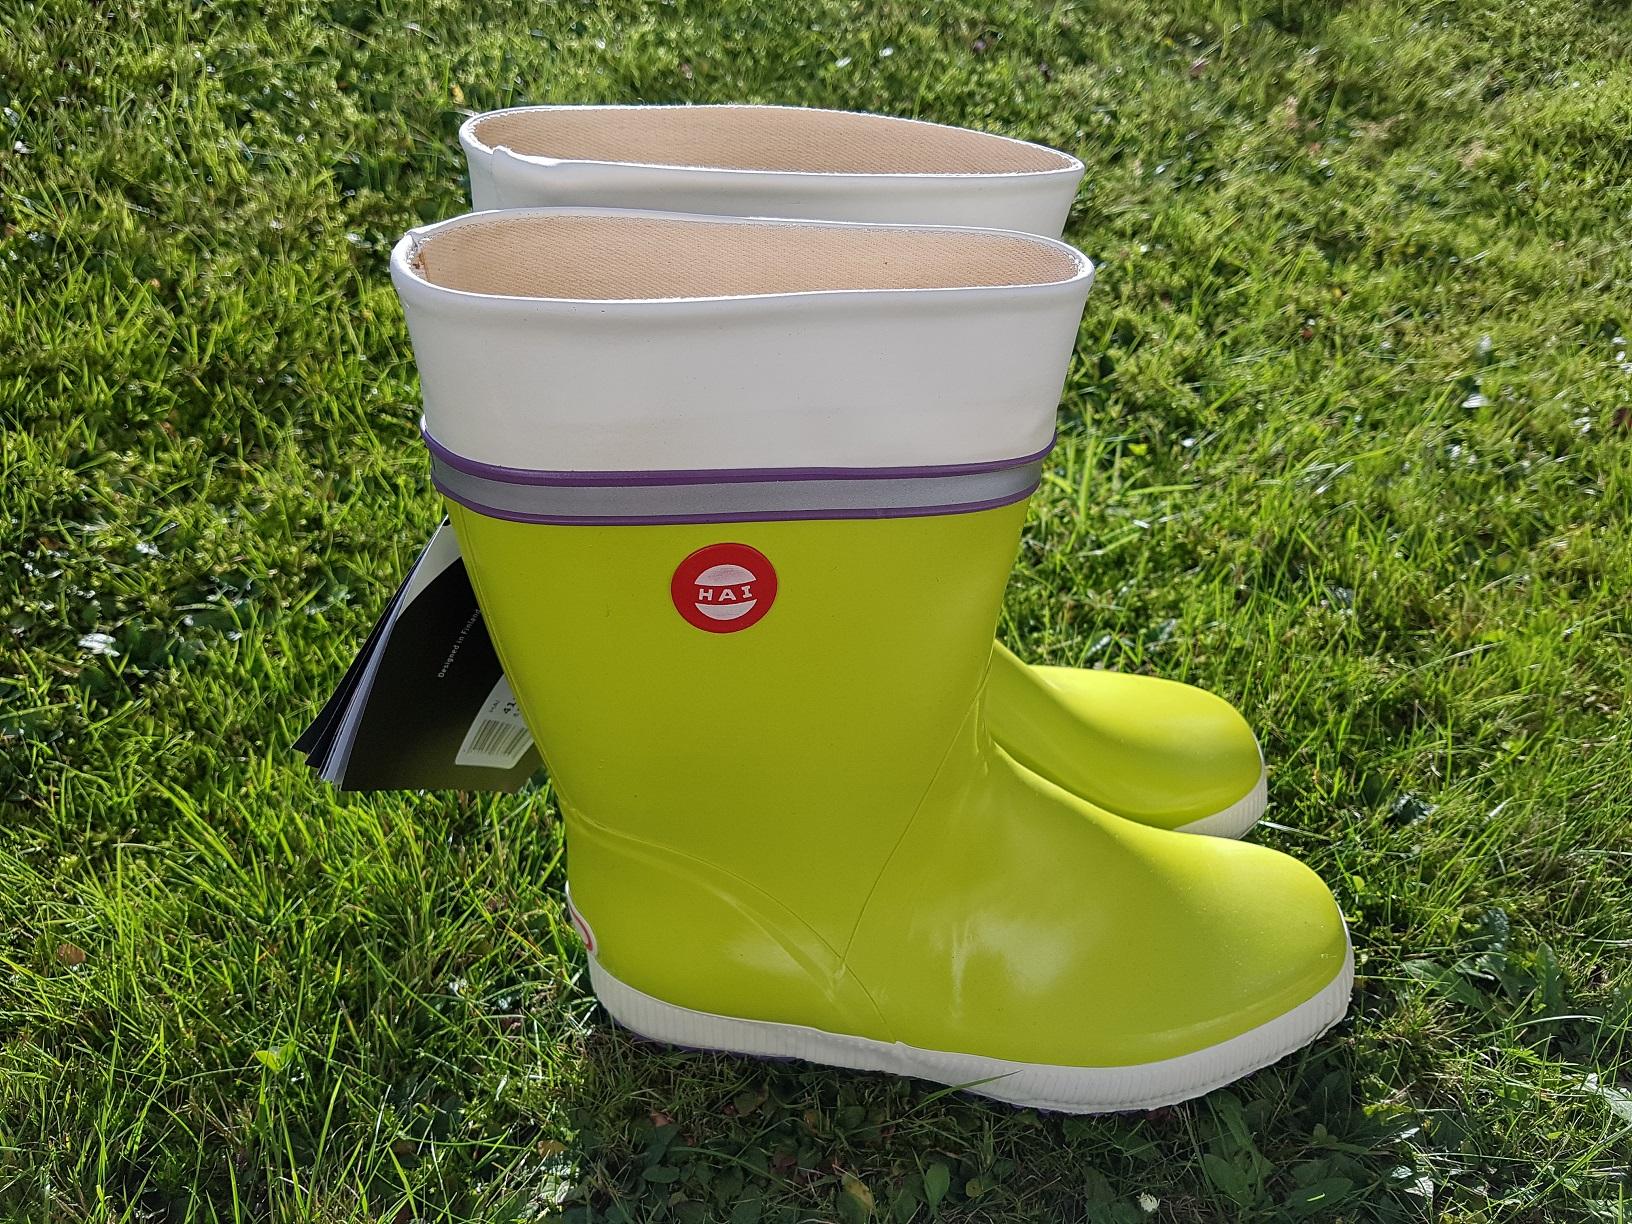 Hai Stiefel Lime Tricolor, Größe 41